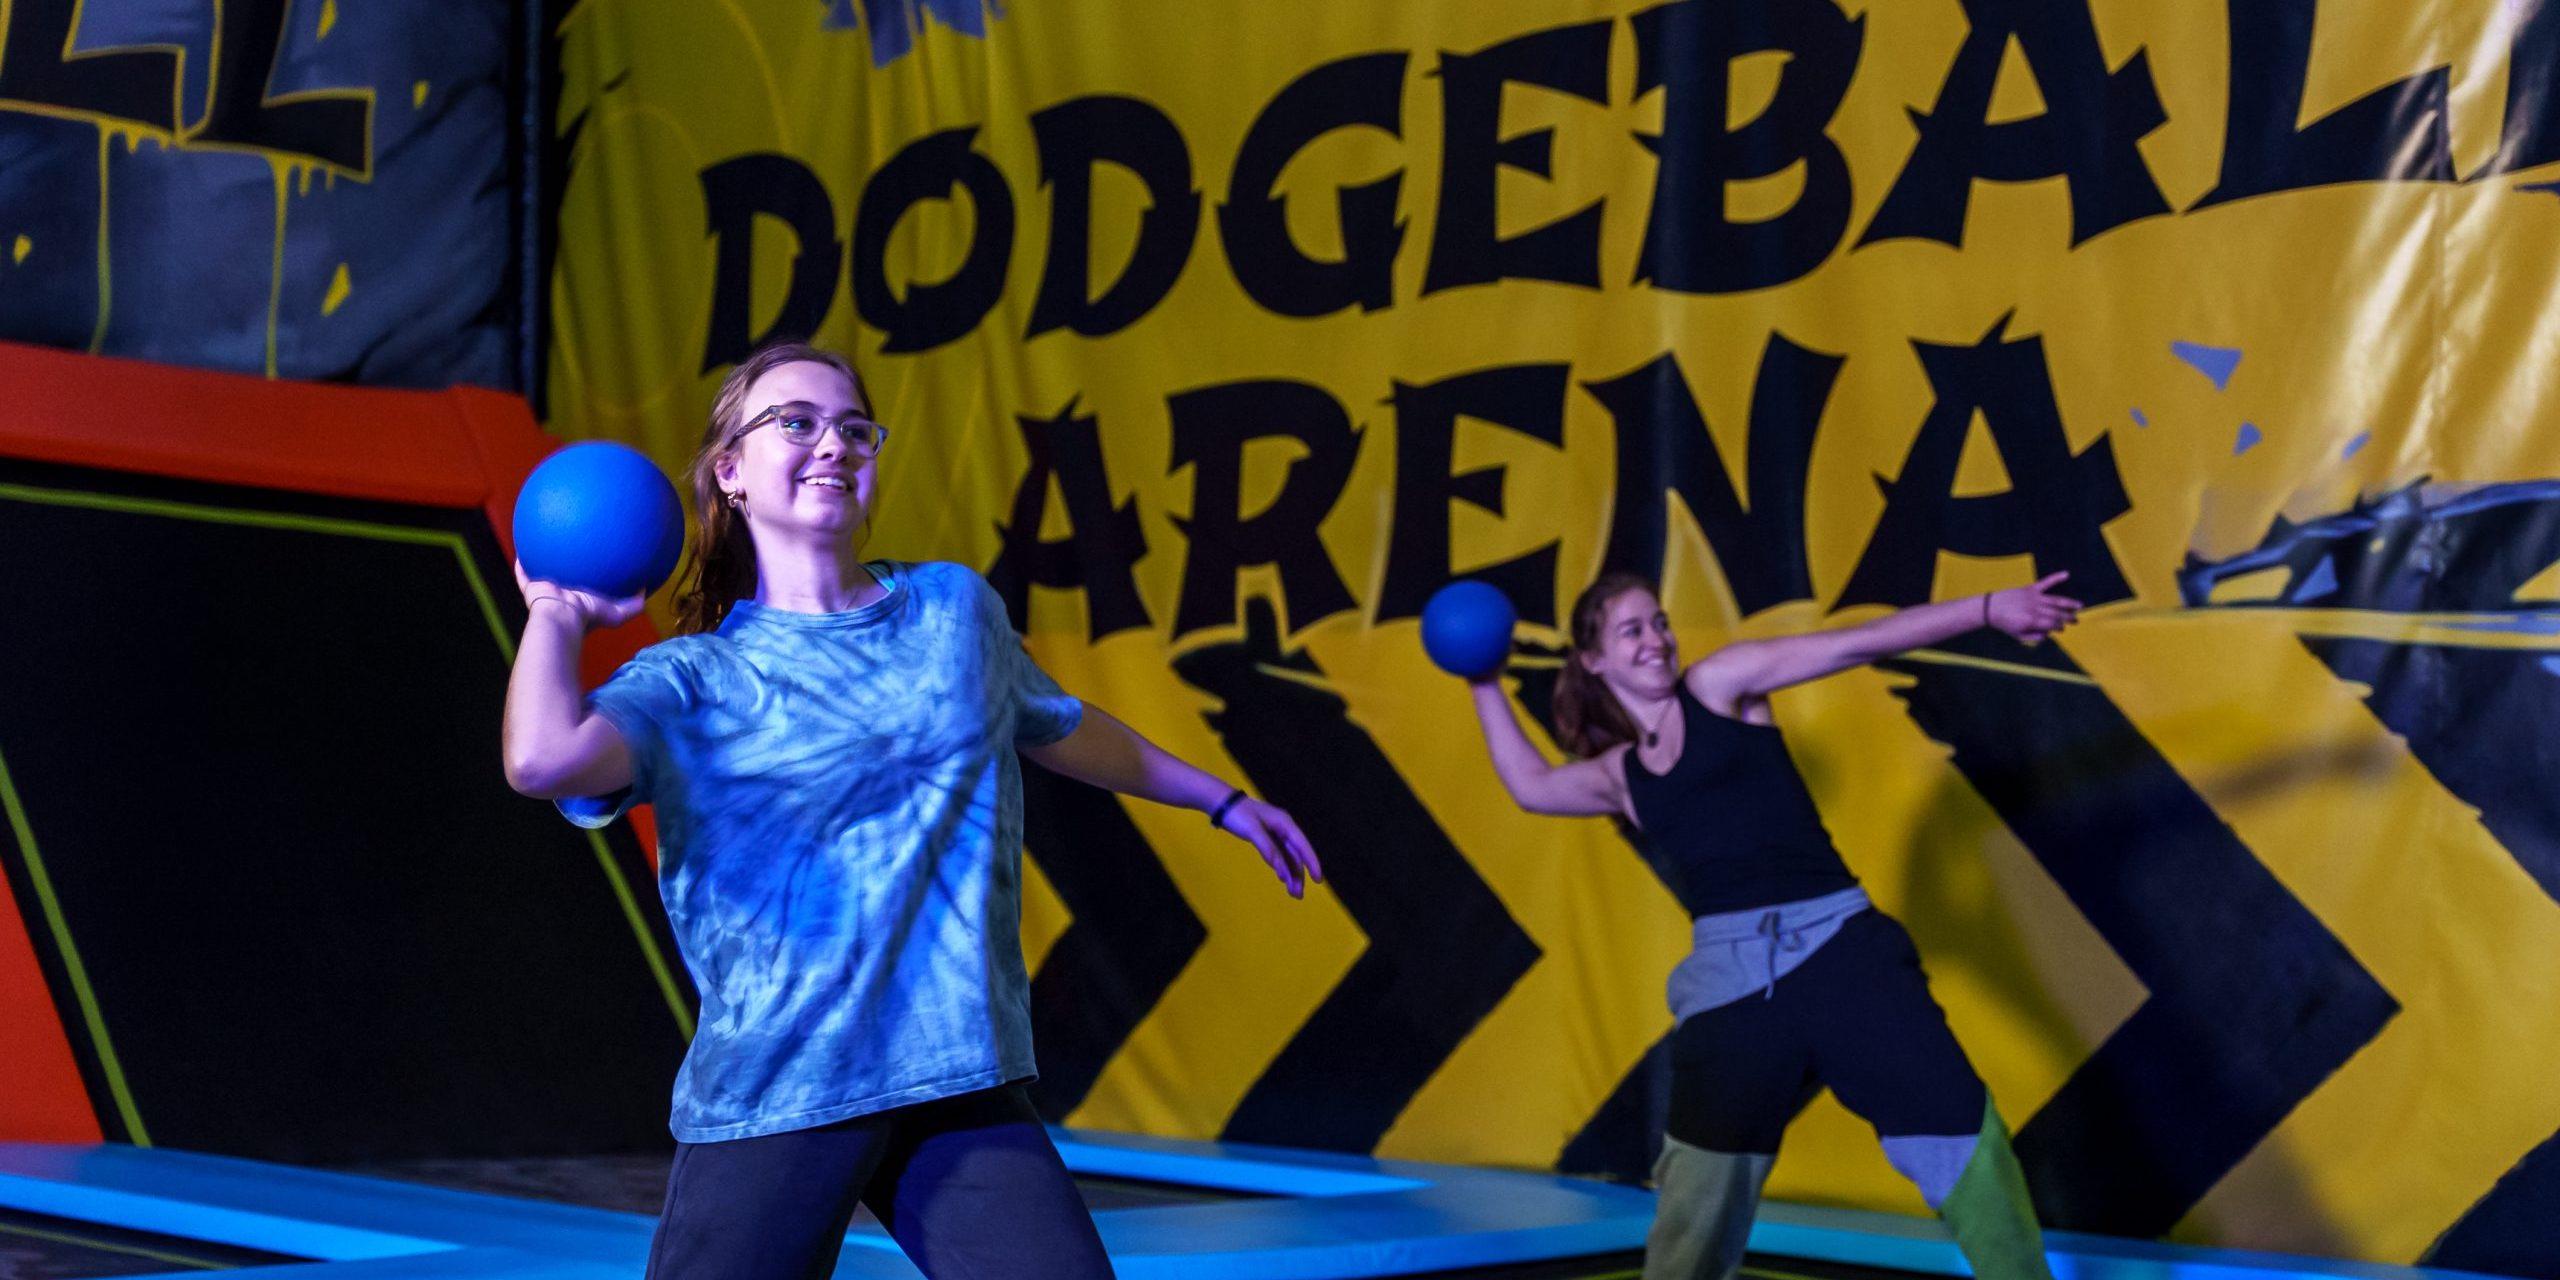 Schulen_Dodgeball-scaled-2560x1280